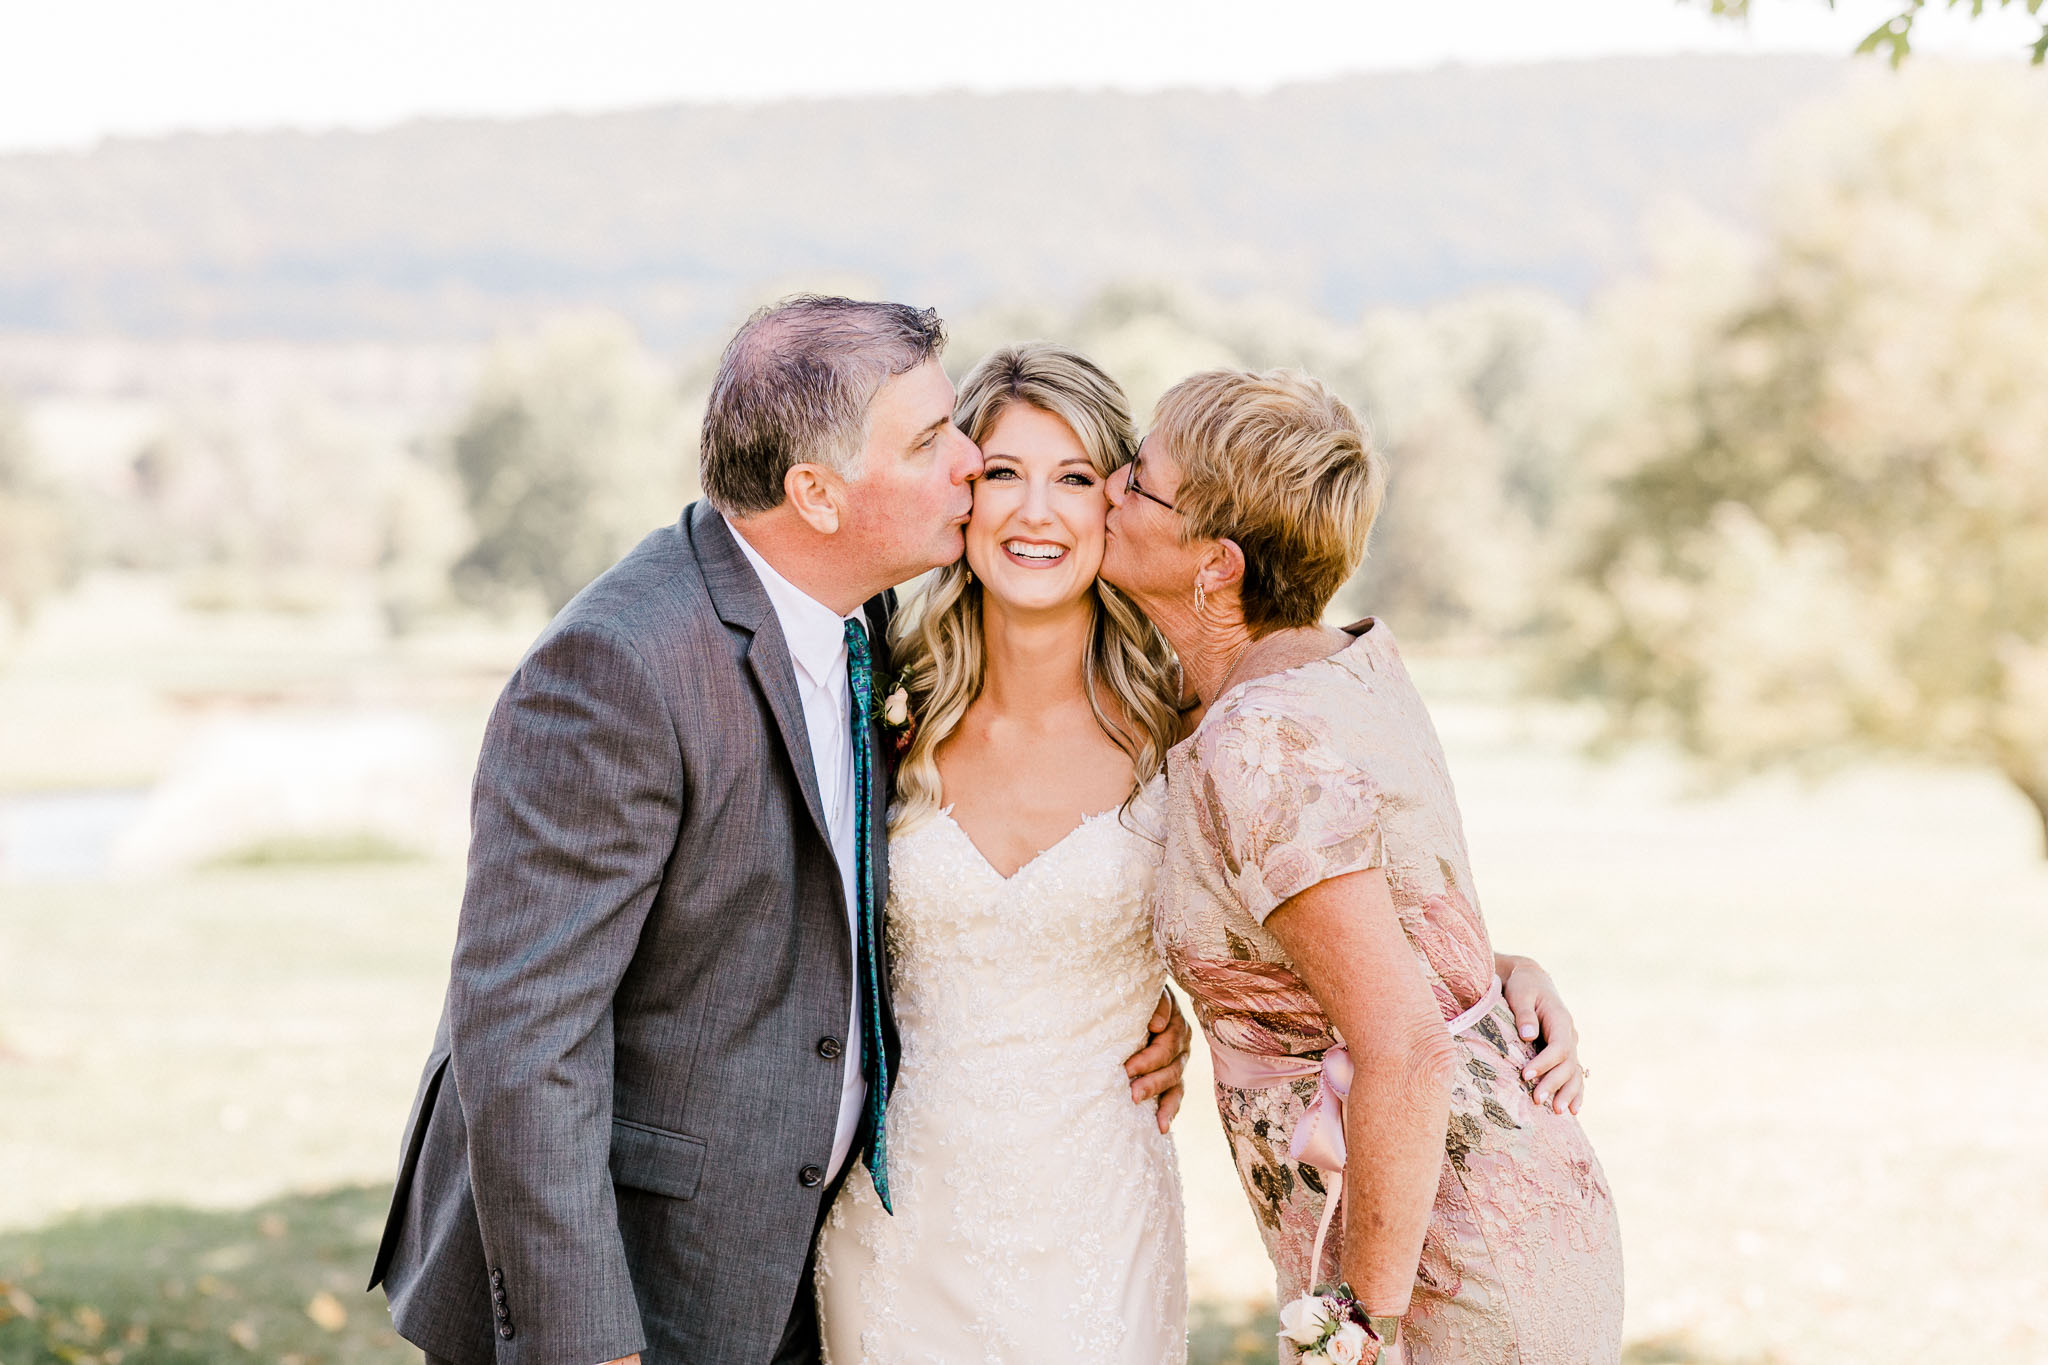 Frosty-Valley-September-Wedding-7227.jpg